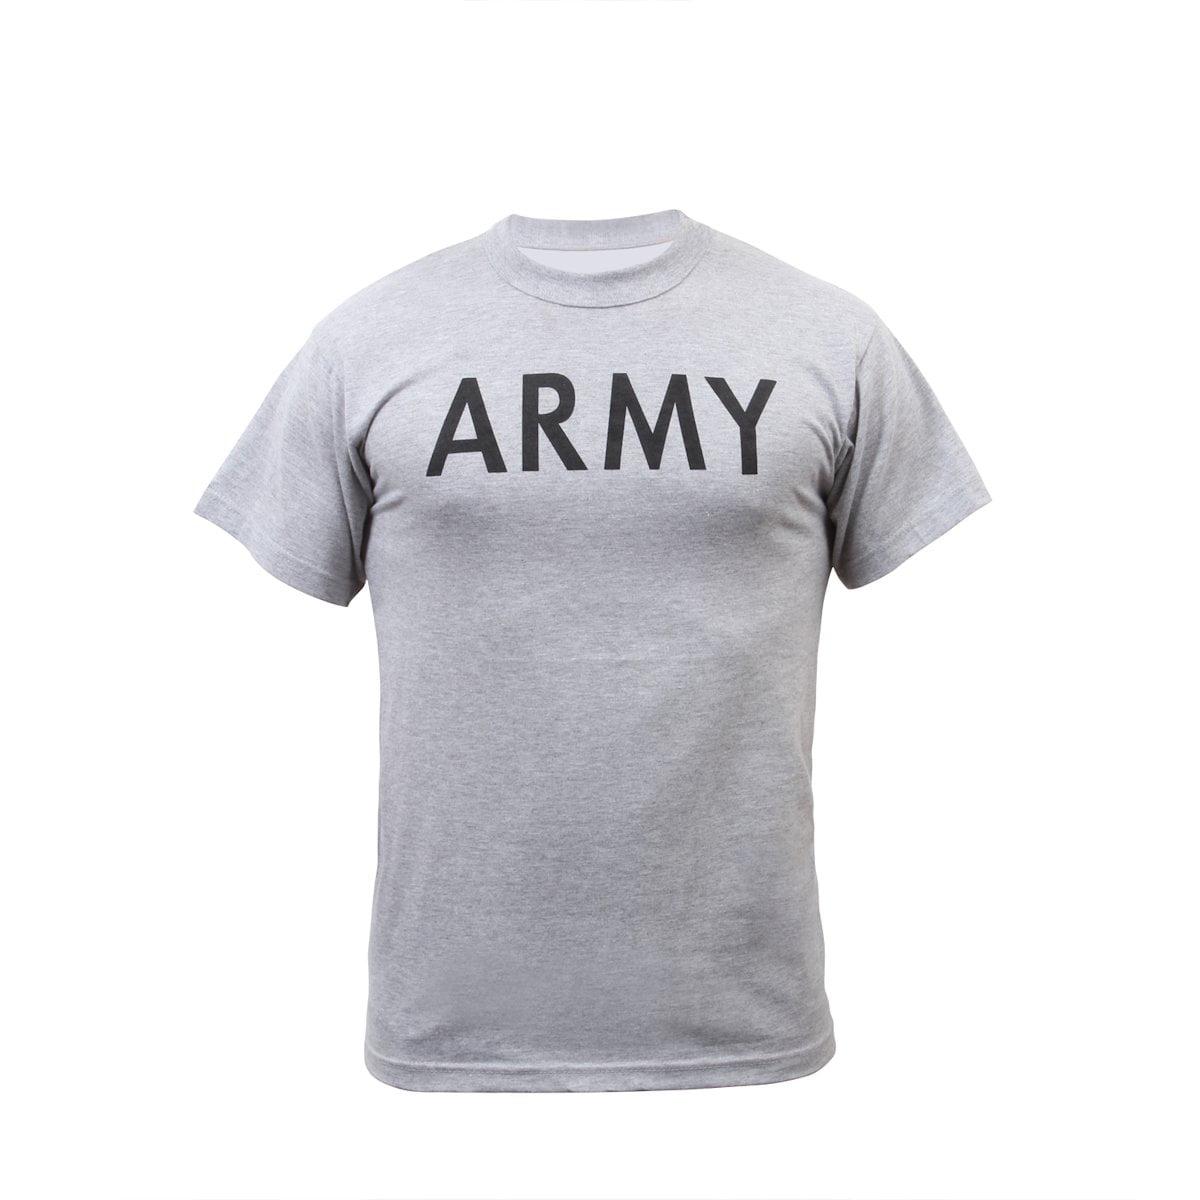 Black t shirt at walmart - Black T Shirt At Walmart 50